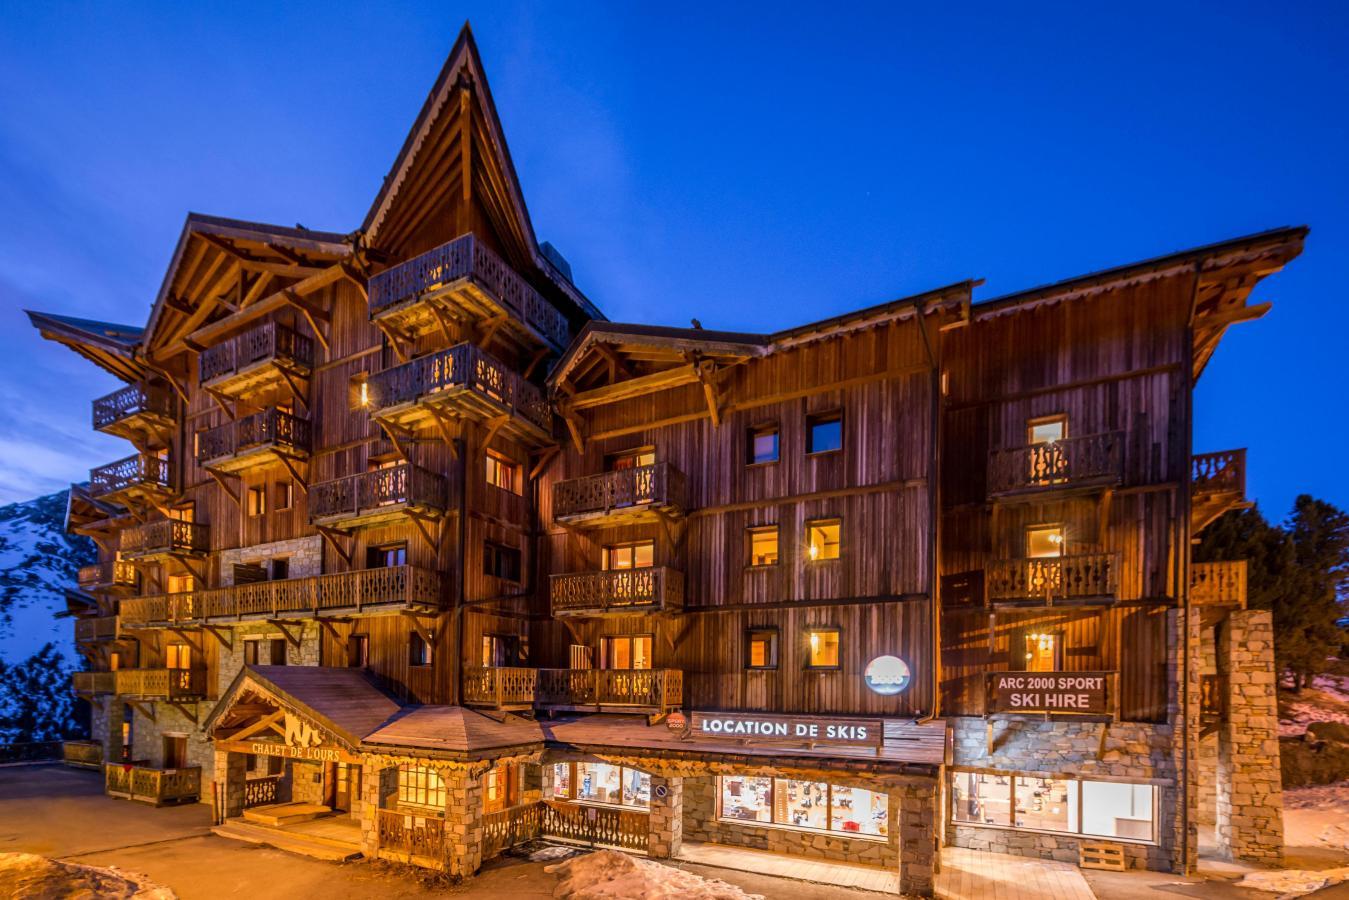 Chalet de lOurs 20 Les Arcs location vacances ski Les Arcs  SkiPlanet